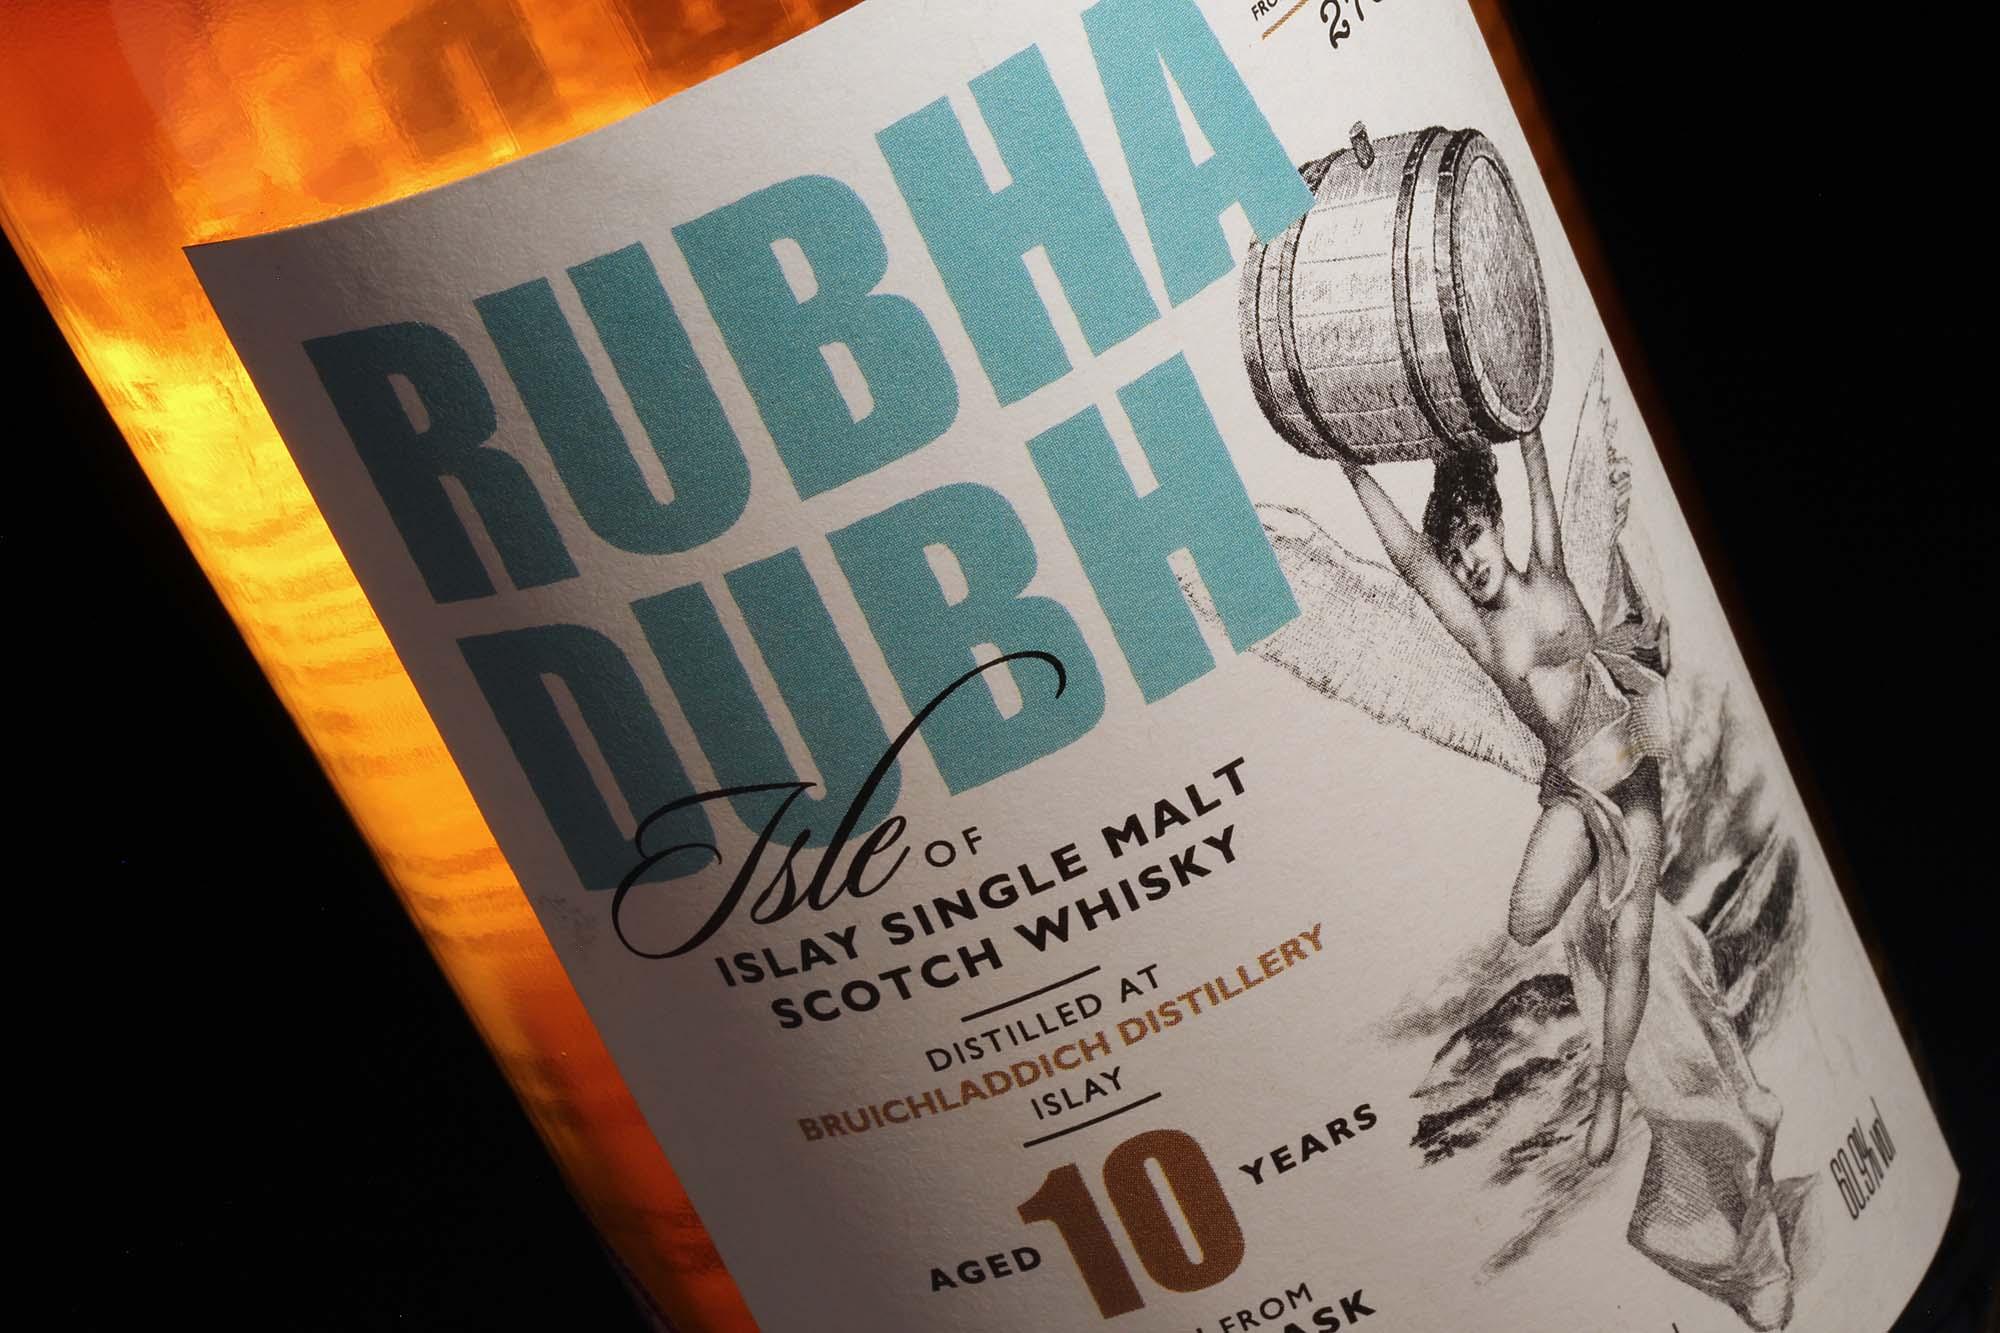 05_Rubha_Dubh_label_HR